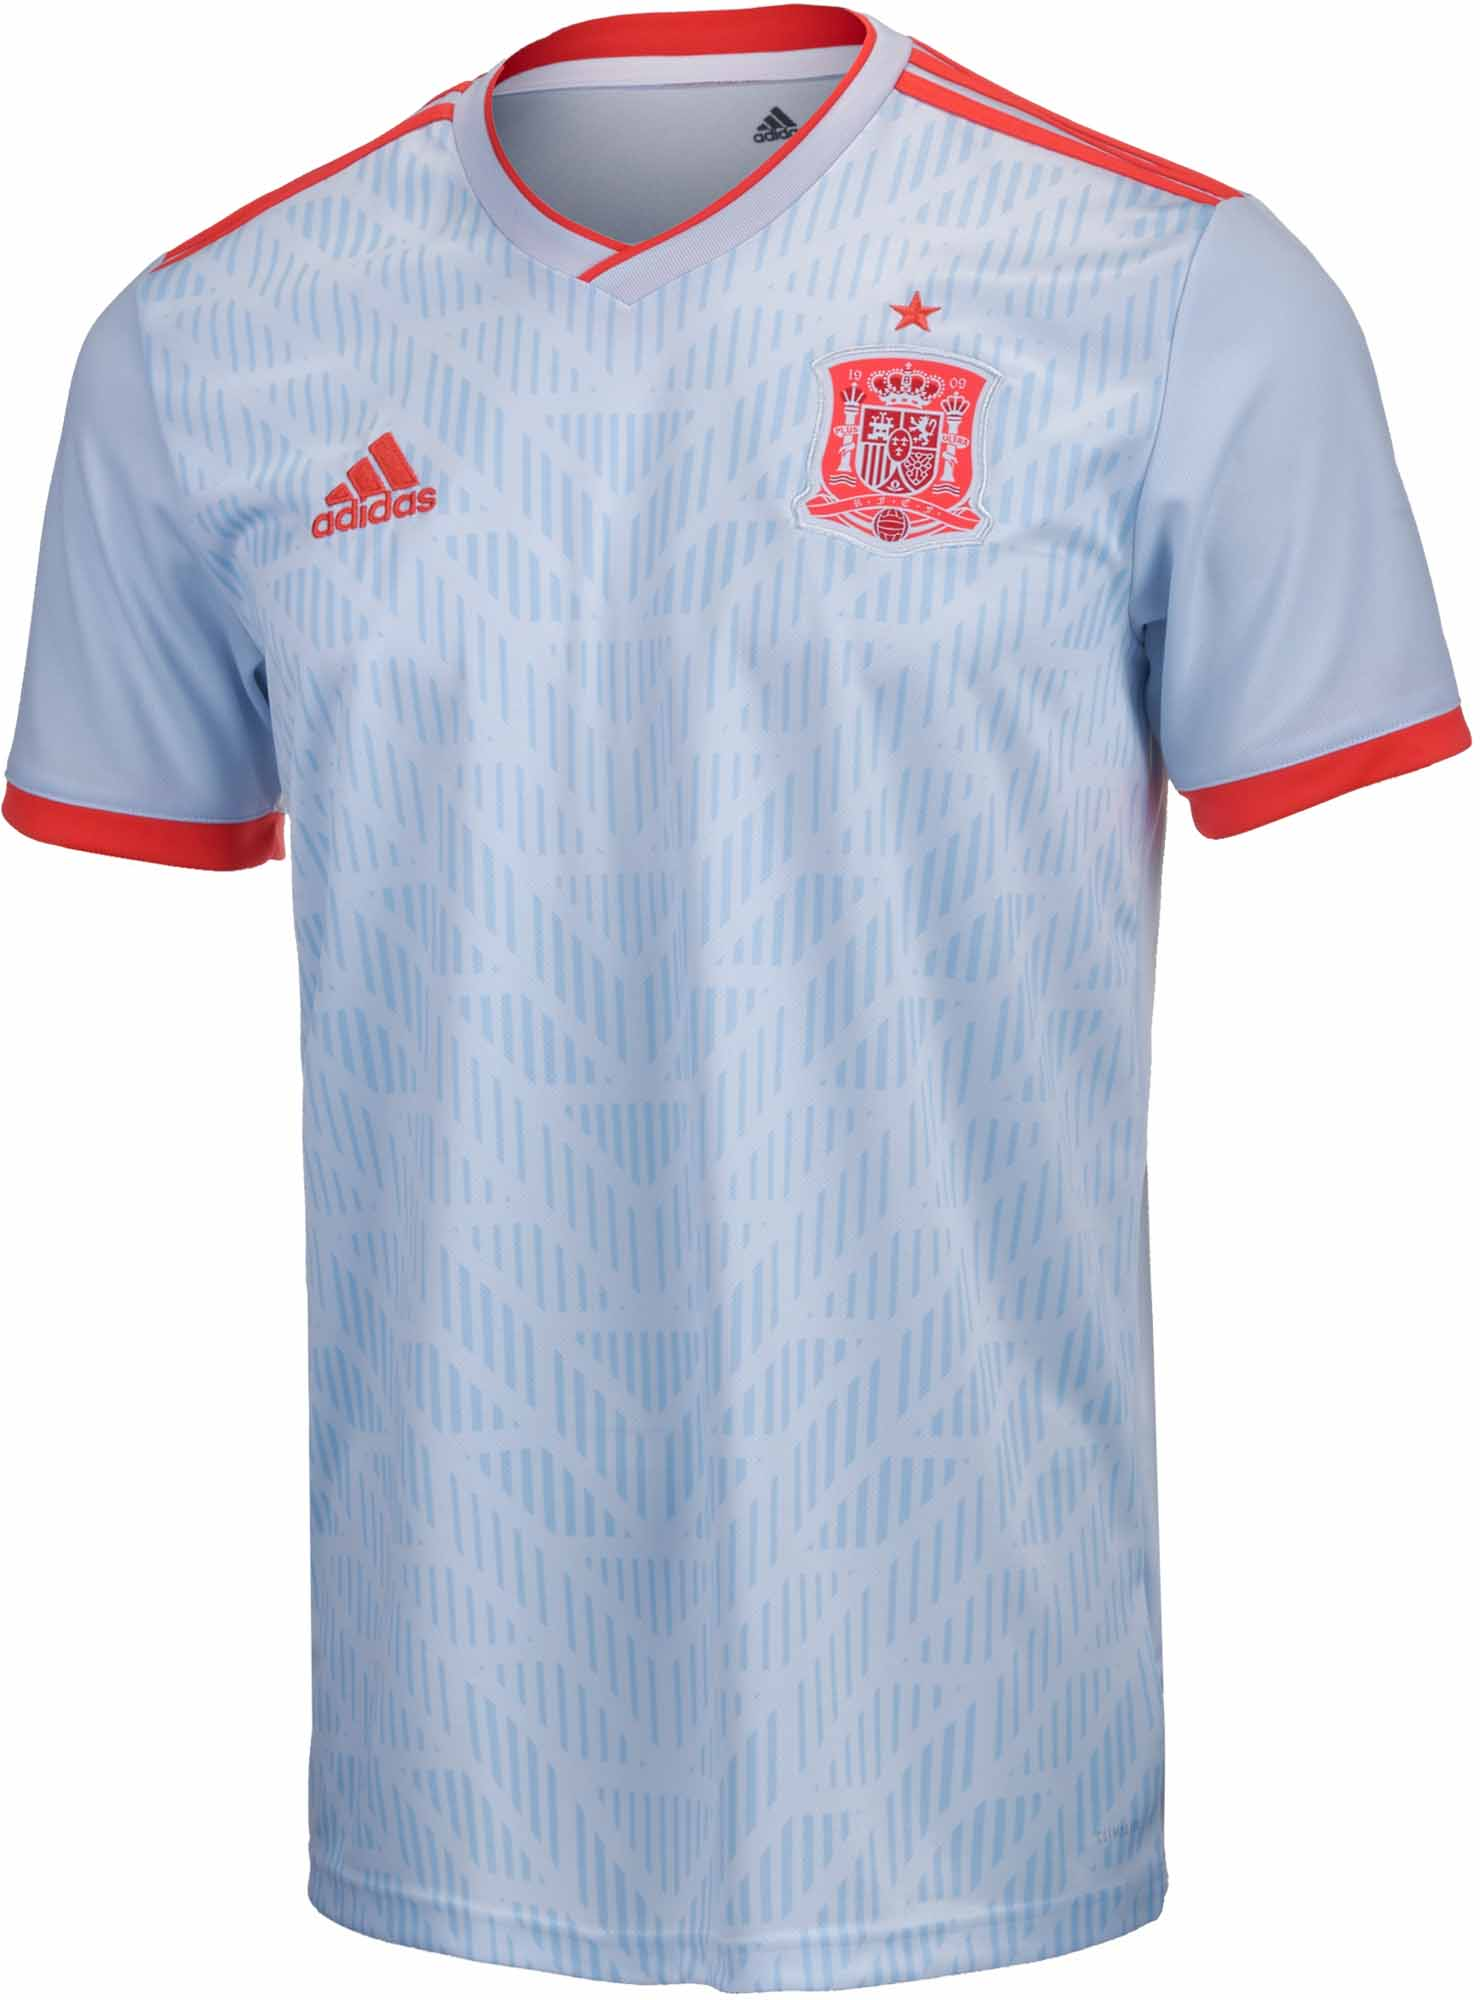 851a296aa79 adidas Spain Away Jersey 2018-19 - SoccerPro.com